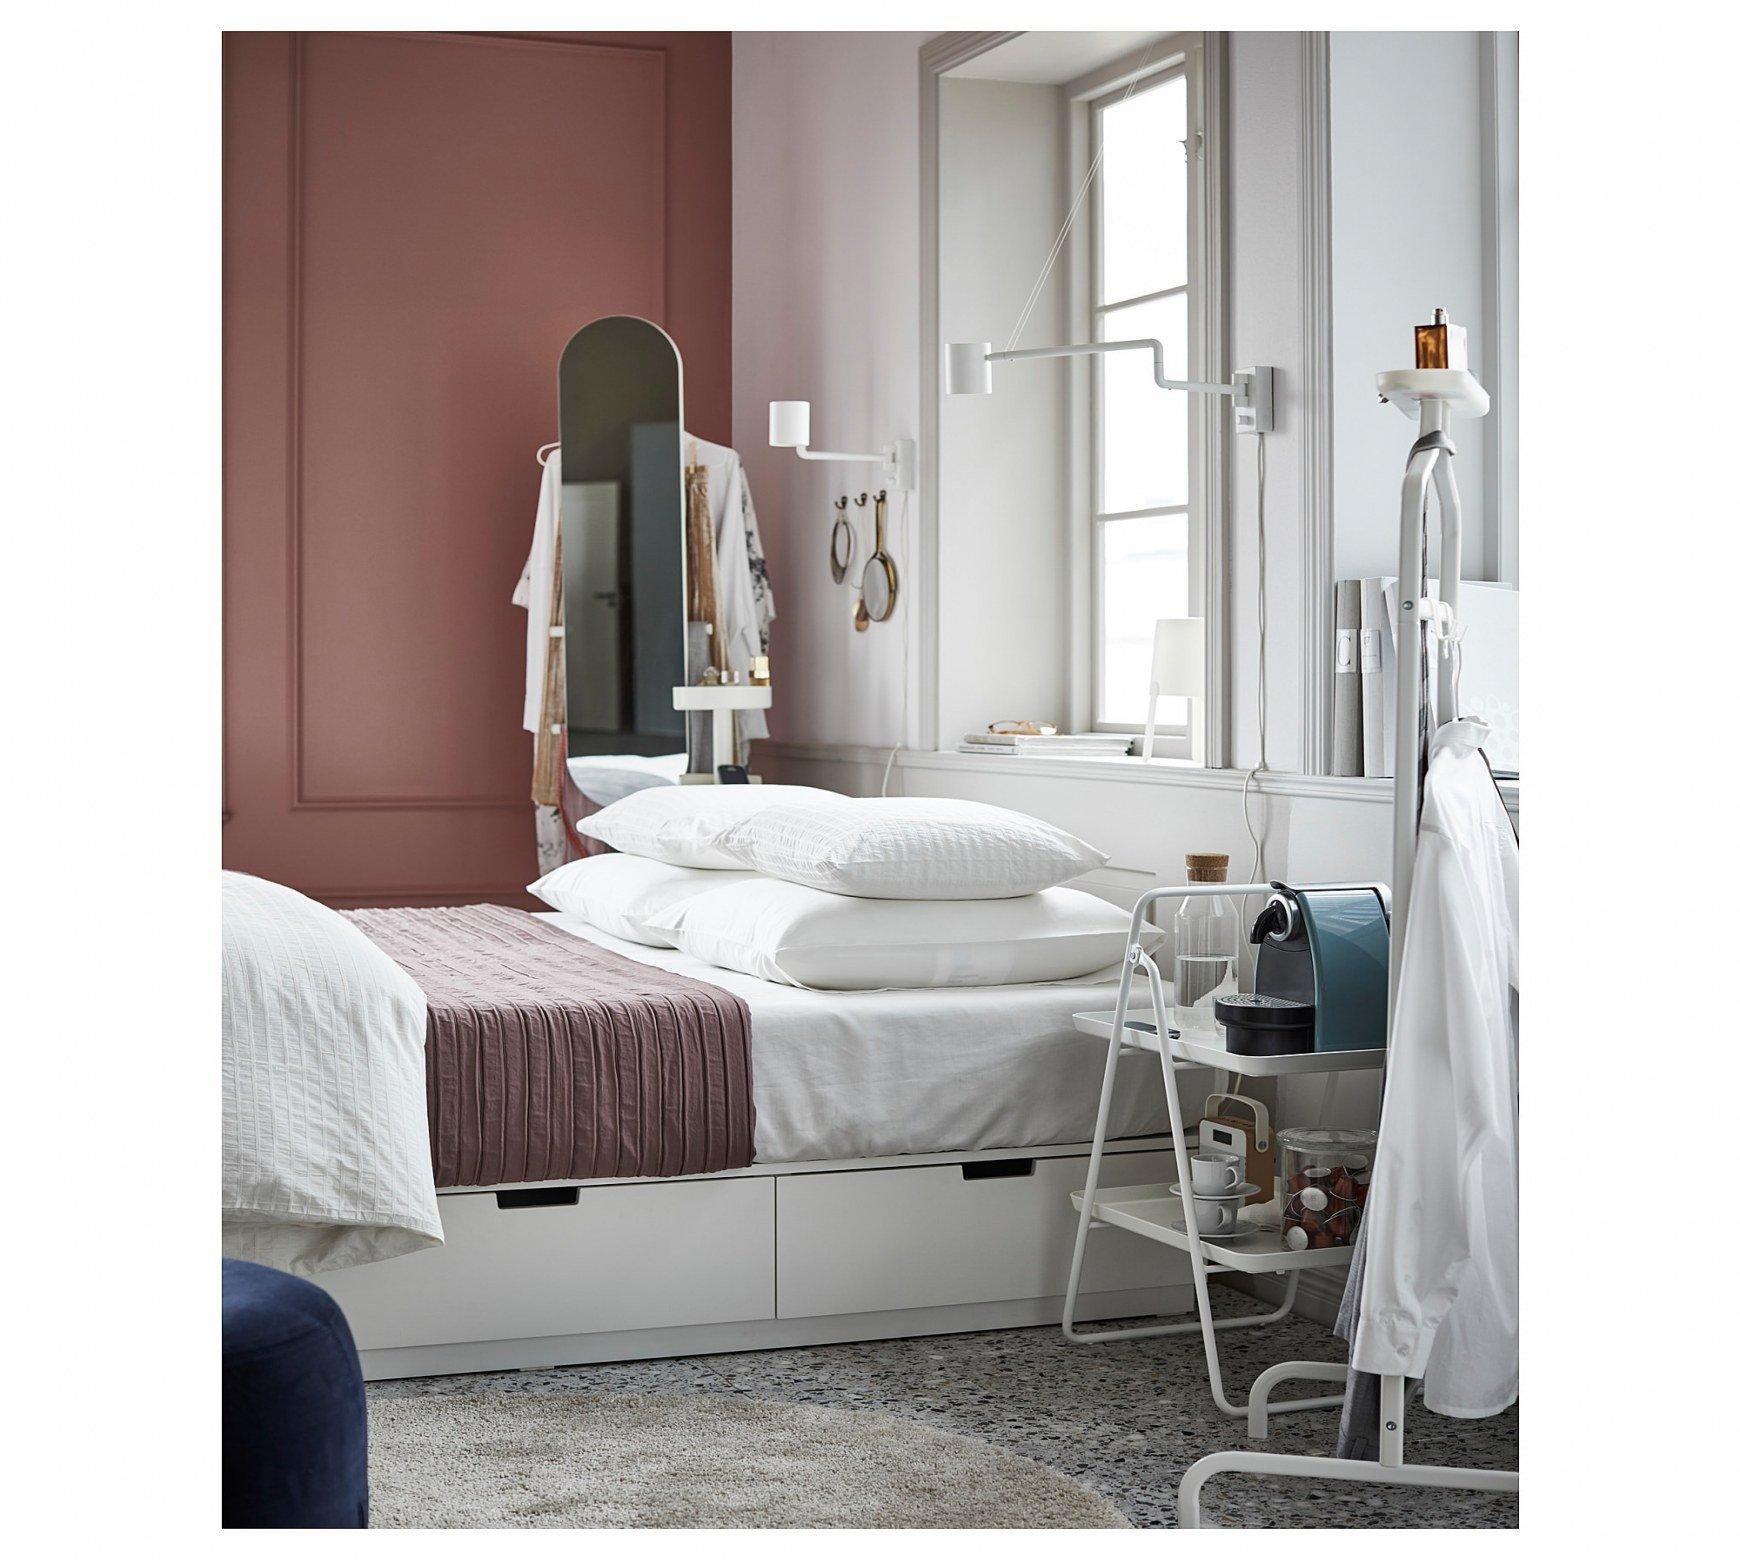 Twin Bedroom Set Ikea Best Of California King Headboard Ikea Ikea nordli Bed Frame with